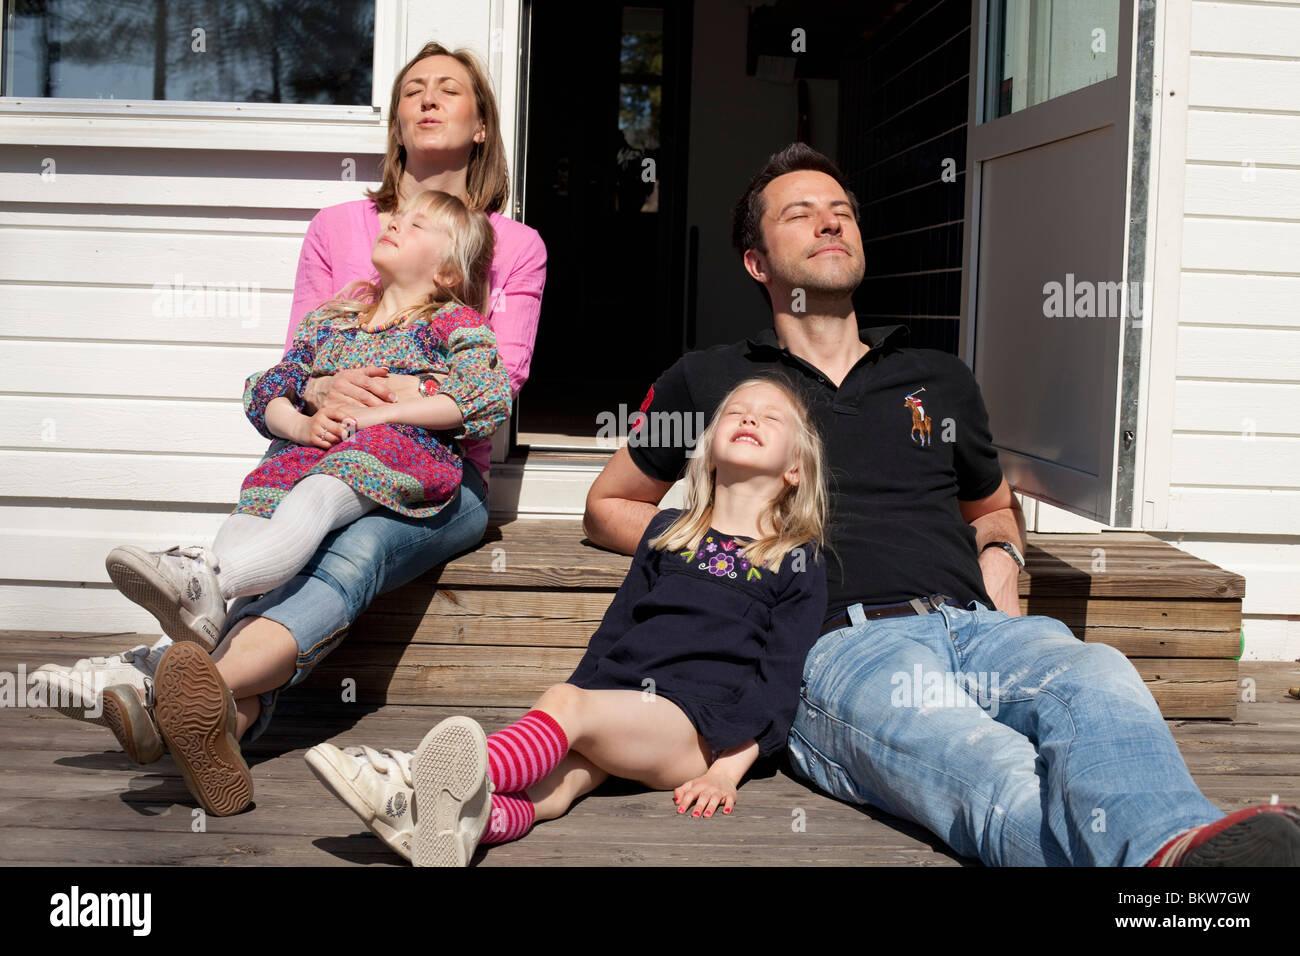 Family enjoying the sun - Stock Image